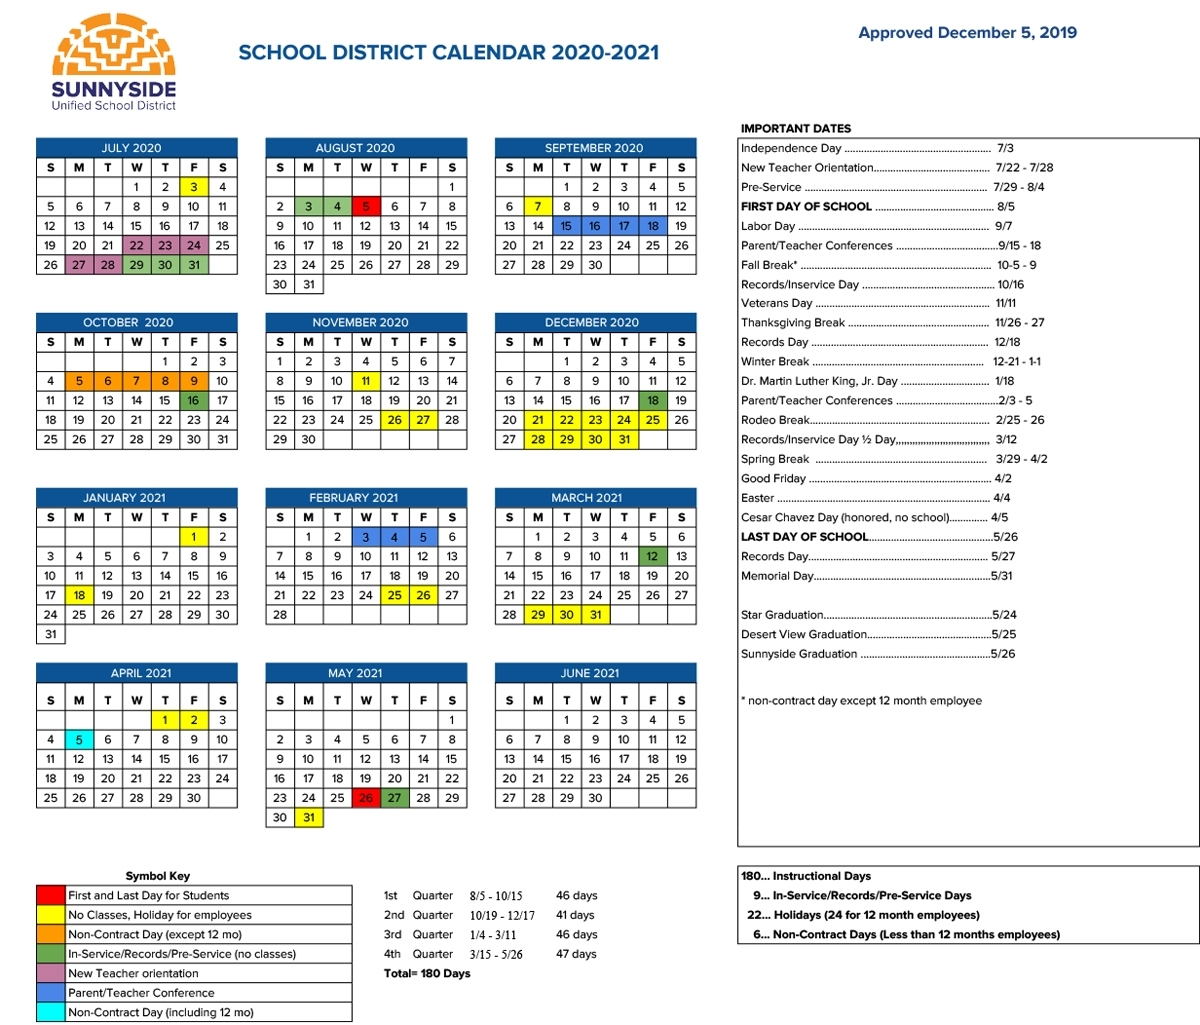 Academic Calendar | Sunnyside Unified School District